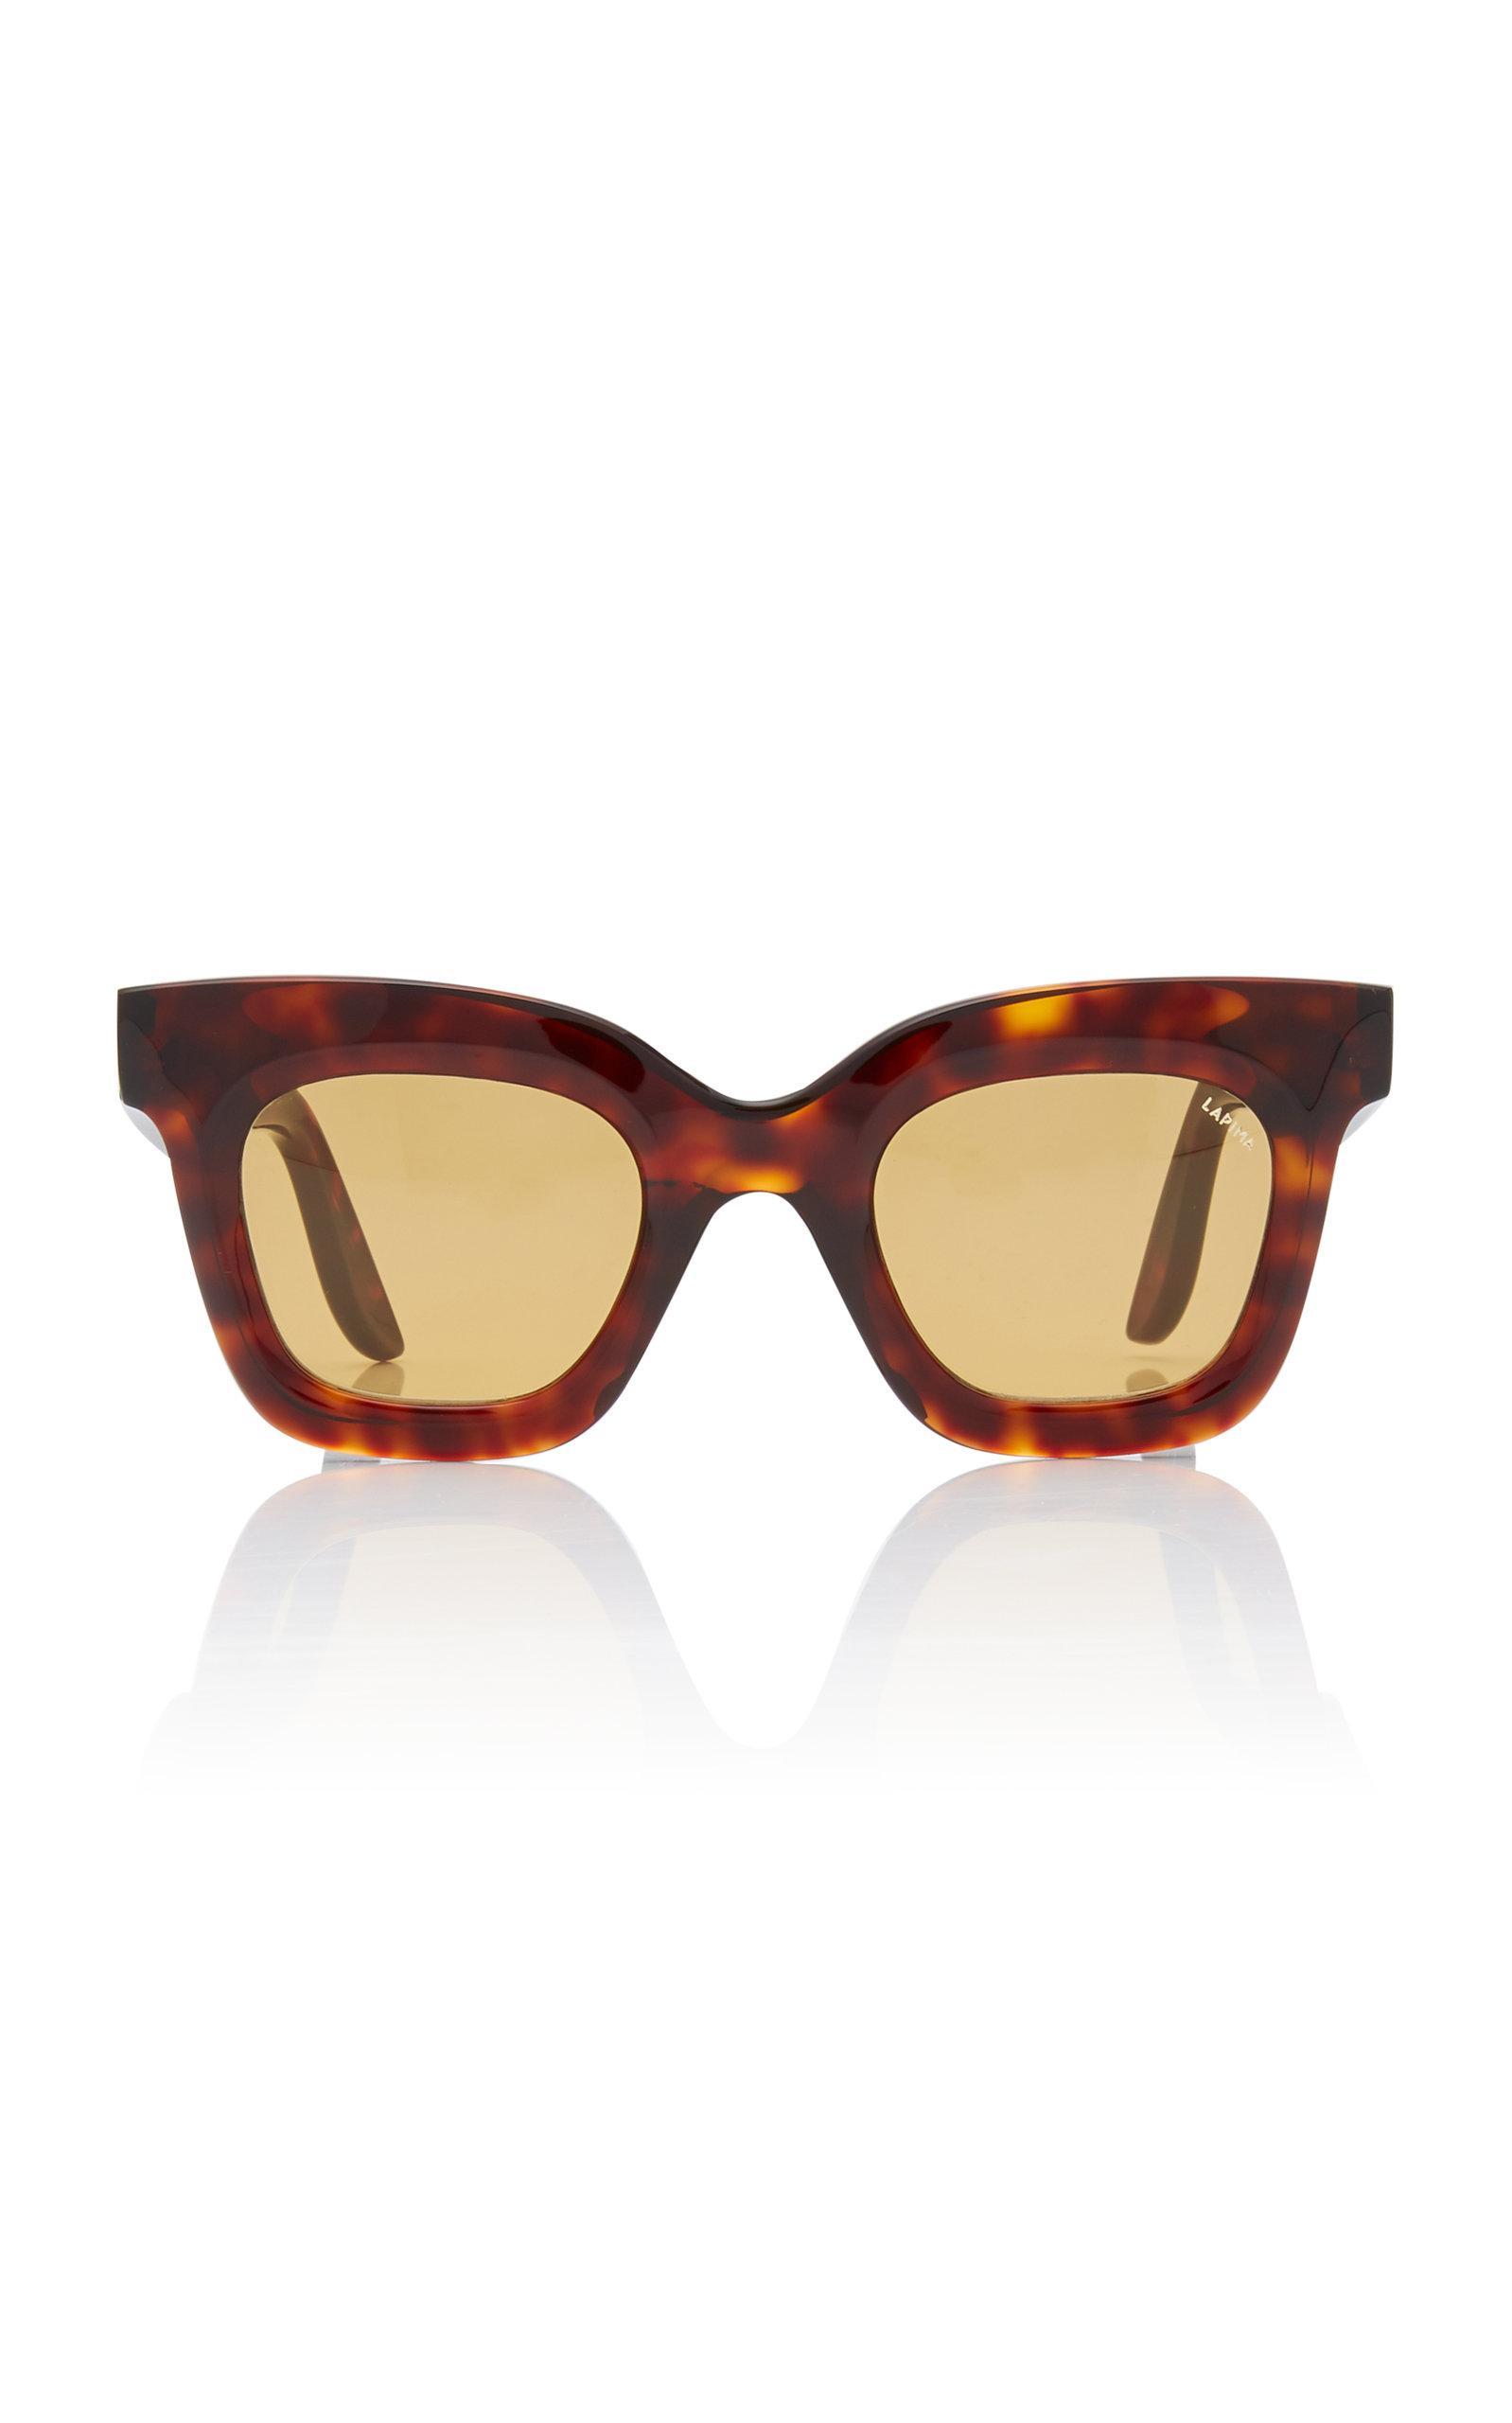 LAPIMA Lisa Square-Frame Tortoiseshell Acetate Sunglasses in Brown